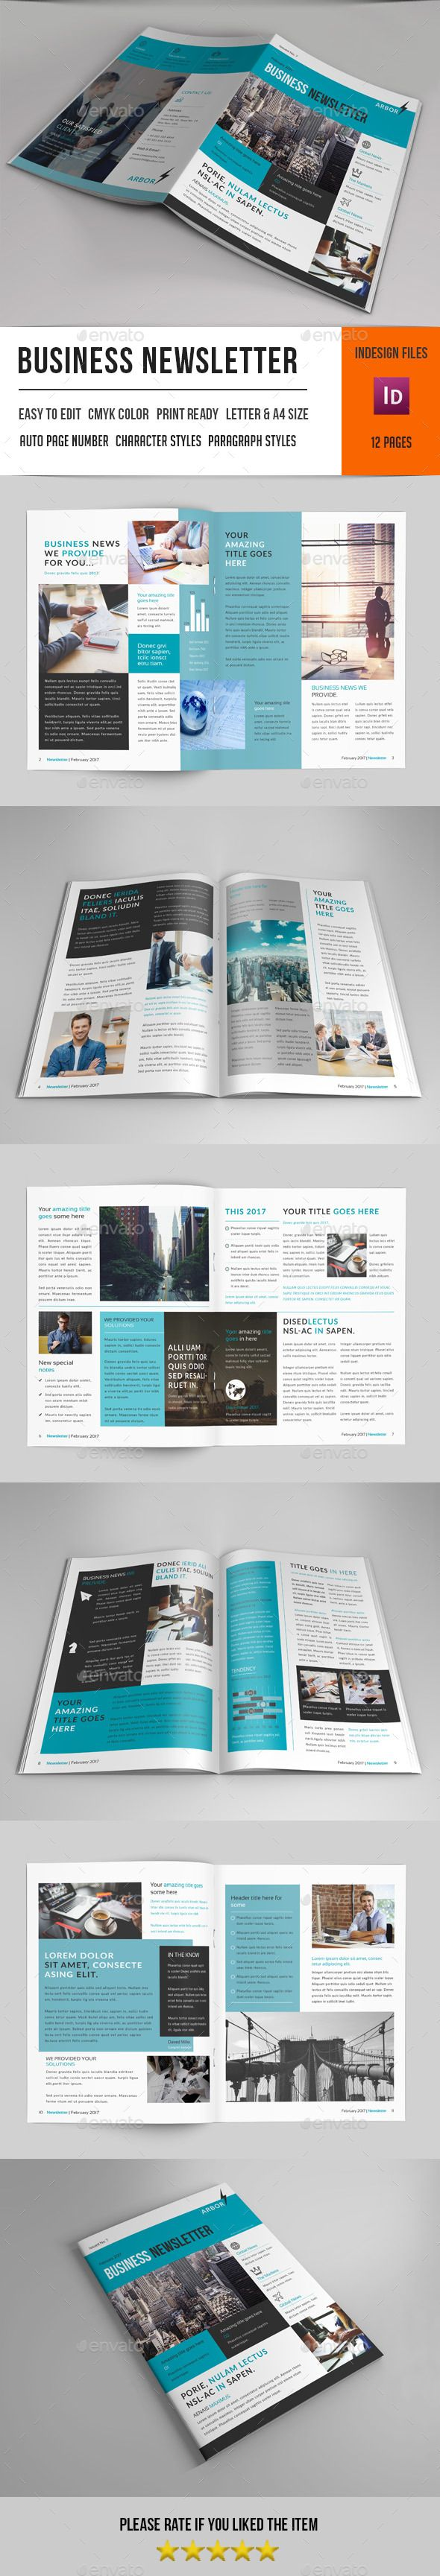 Business Newsletter-V12 - Newsletters Print Templates Download here : https://graphicriver.net/item/business-newsletterv12/19602098?s_rank=8&ref=Al-fatih